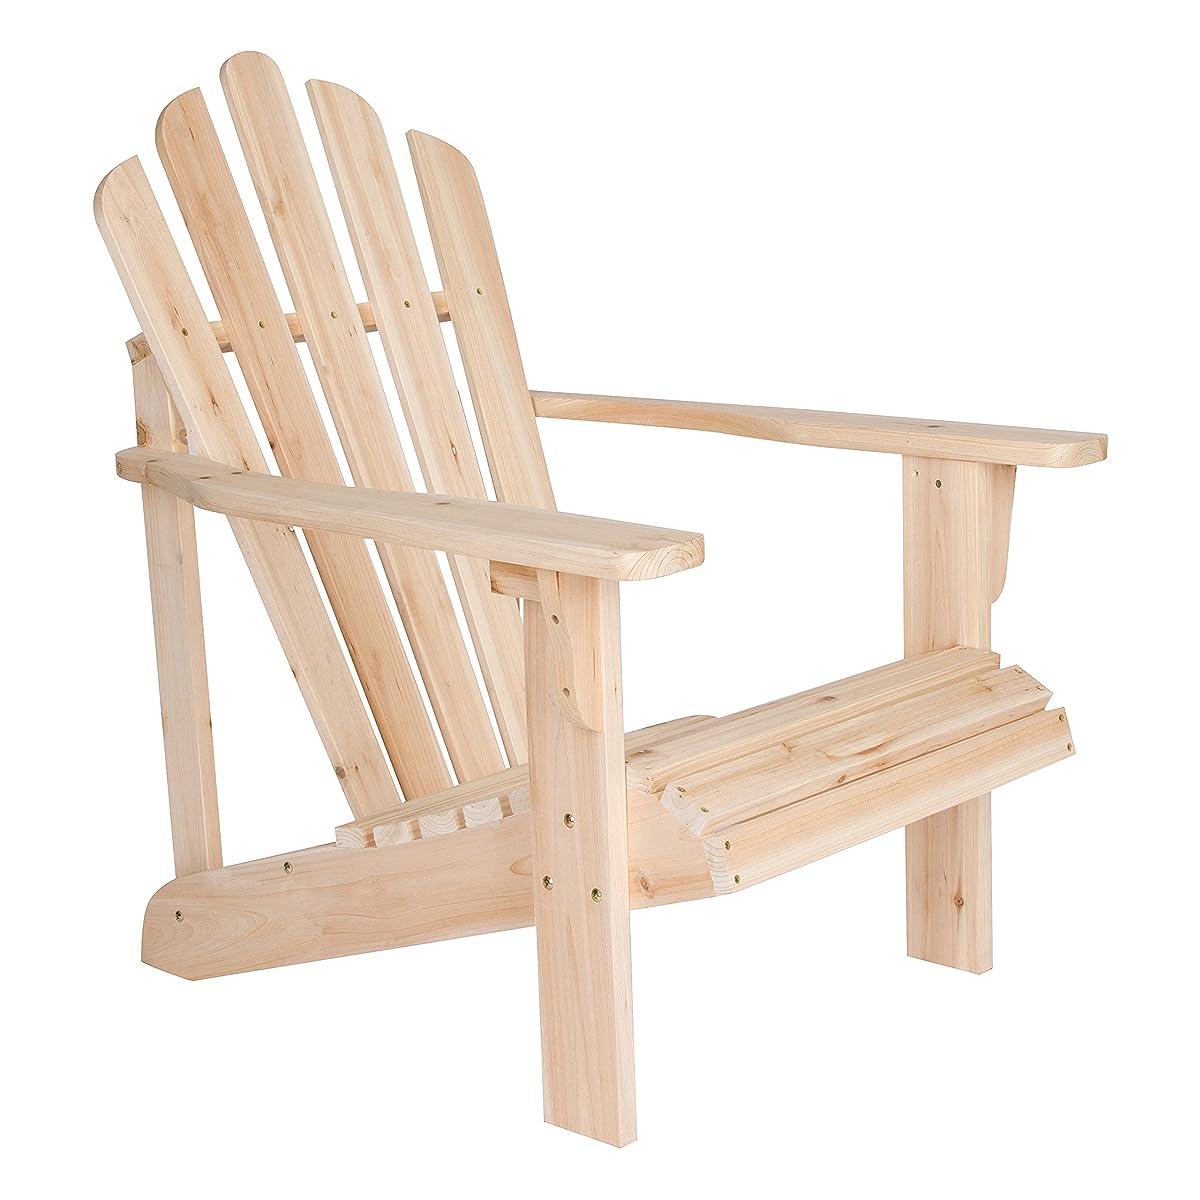 shine company westport adirondack chair instructions